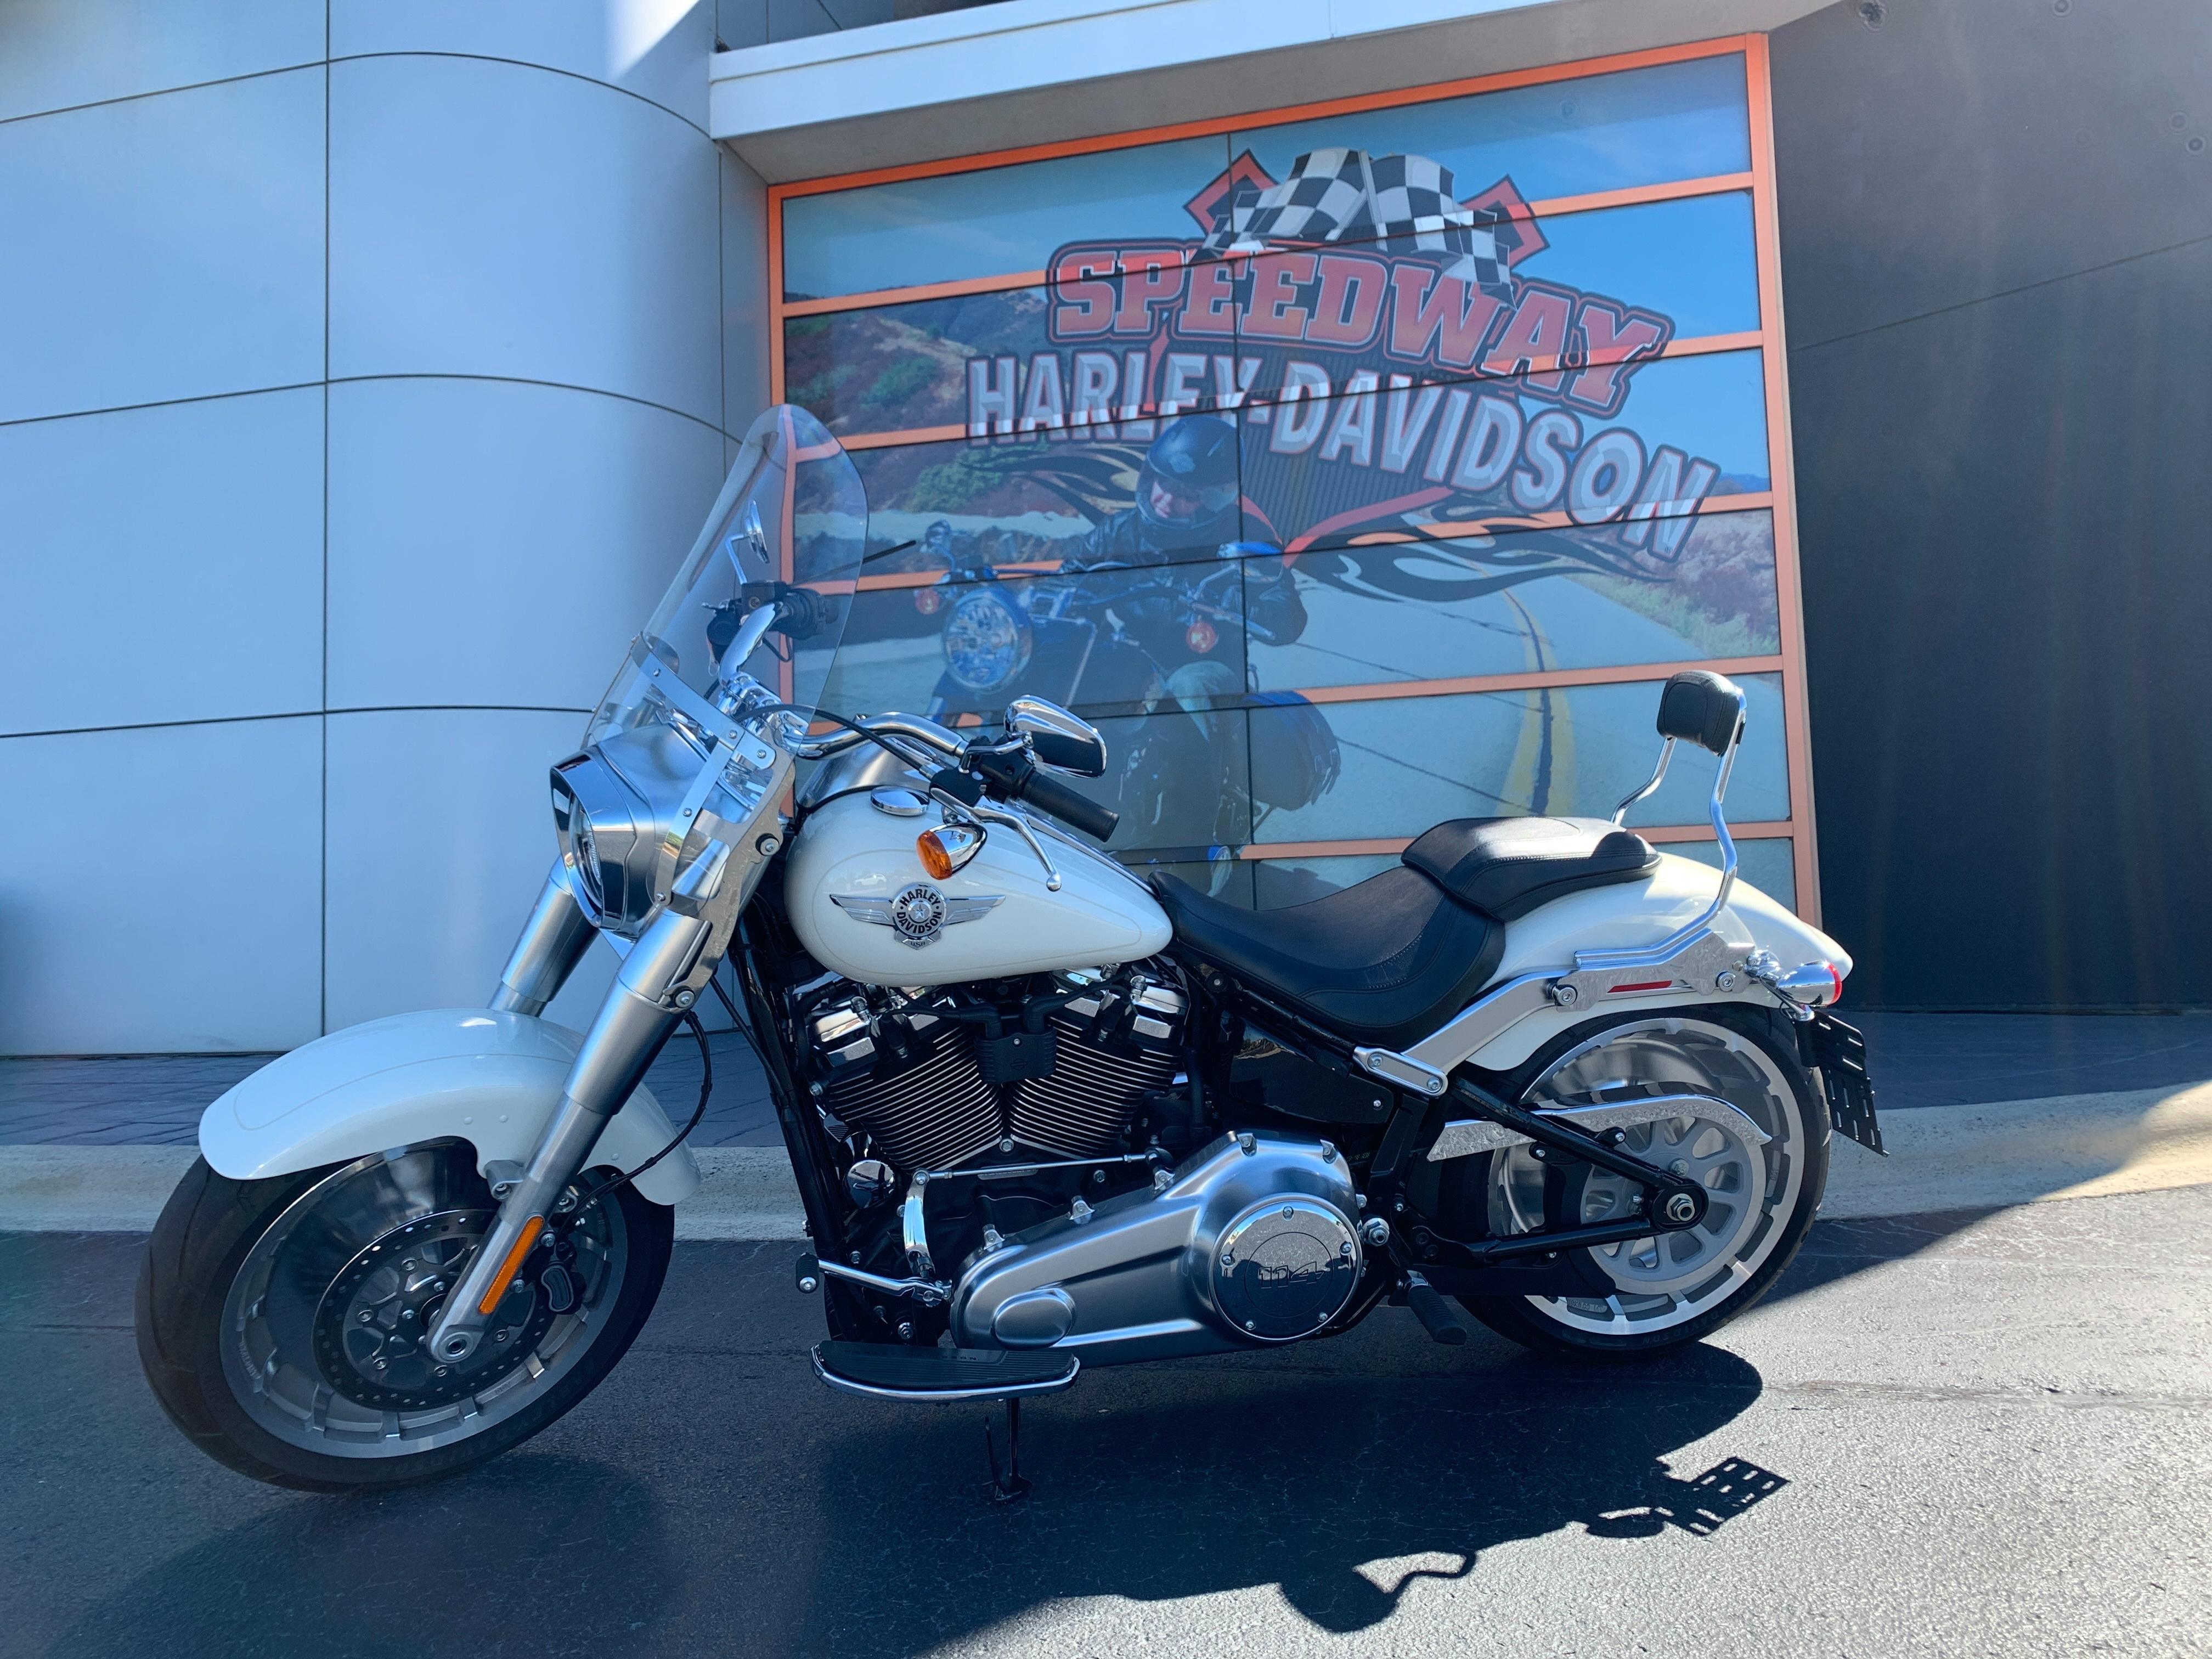 2018 Harley-Davidson Softail Fat Boy 114 at Speedway Harley-Davidson